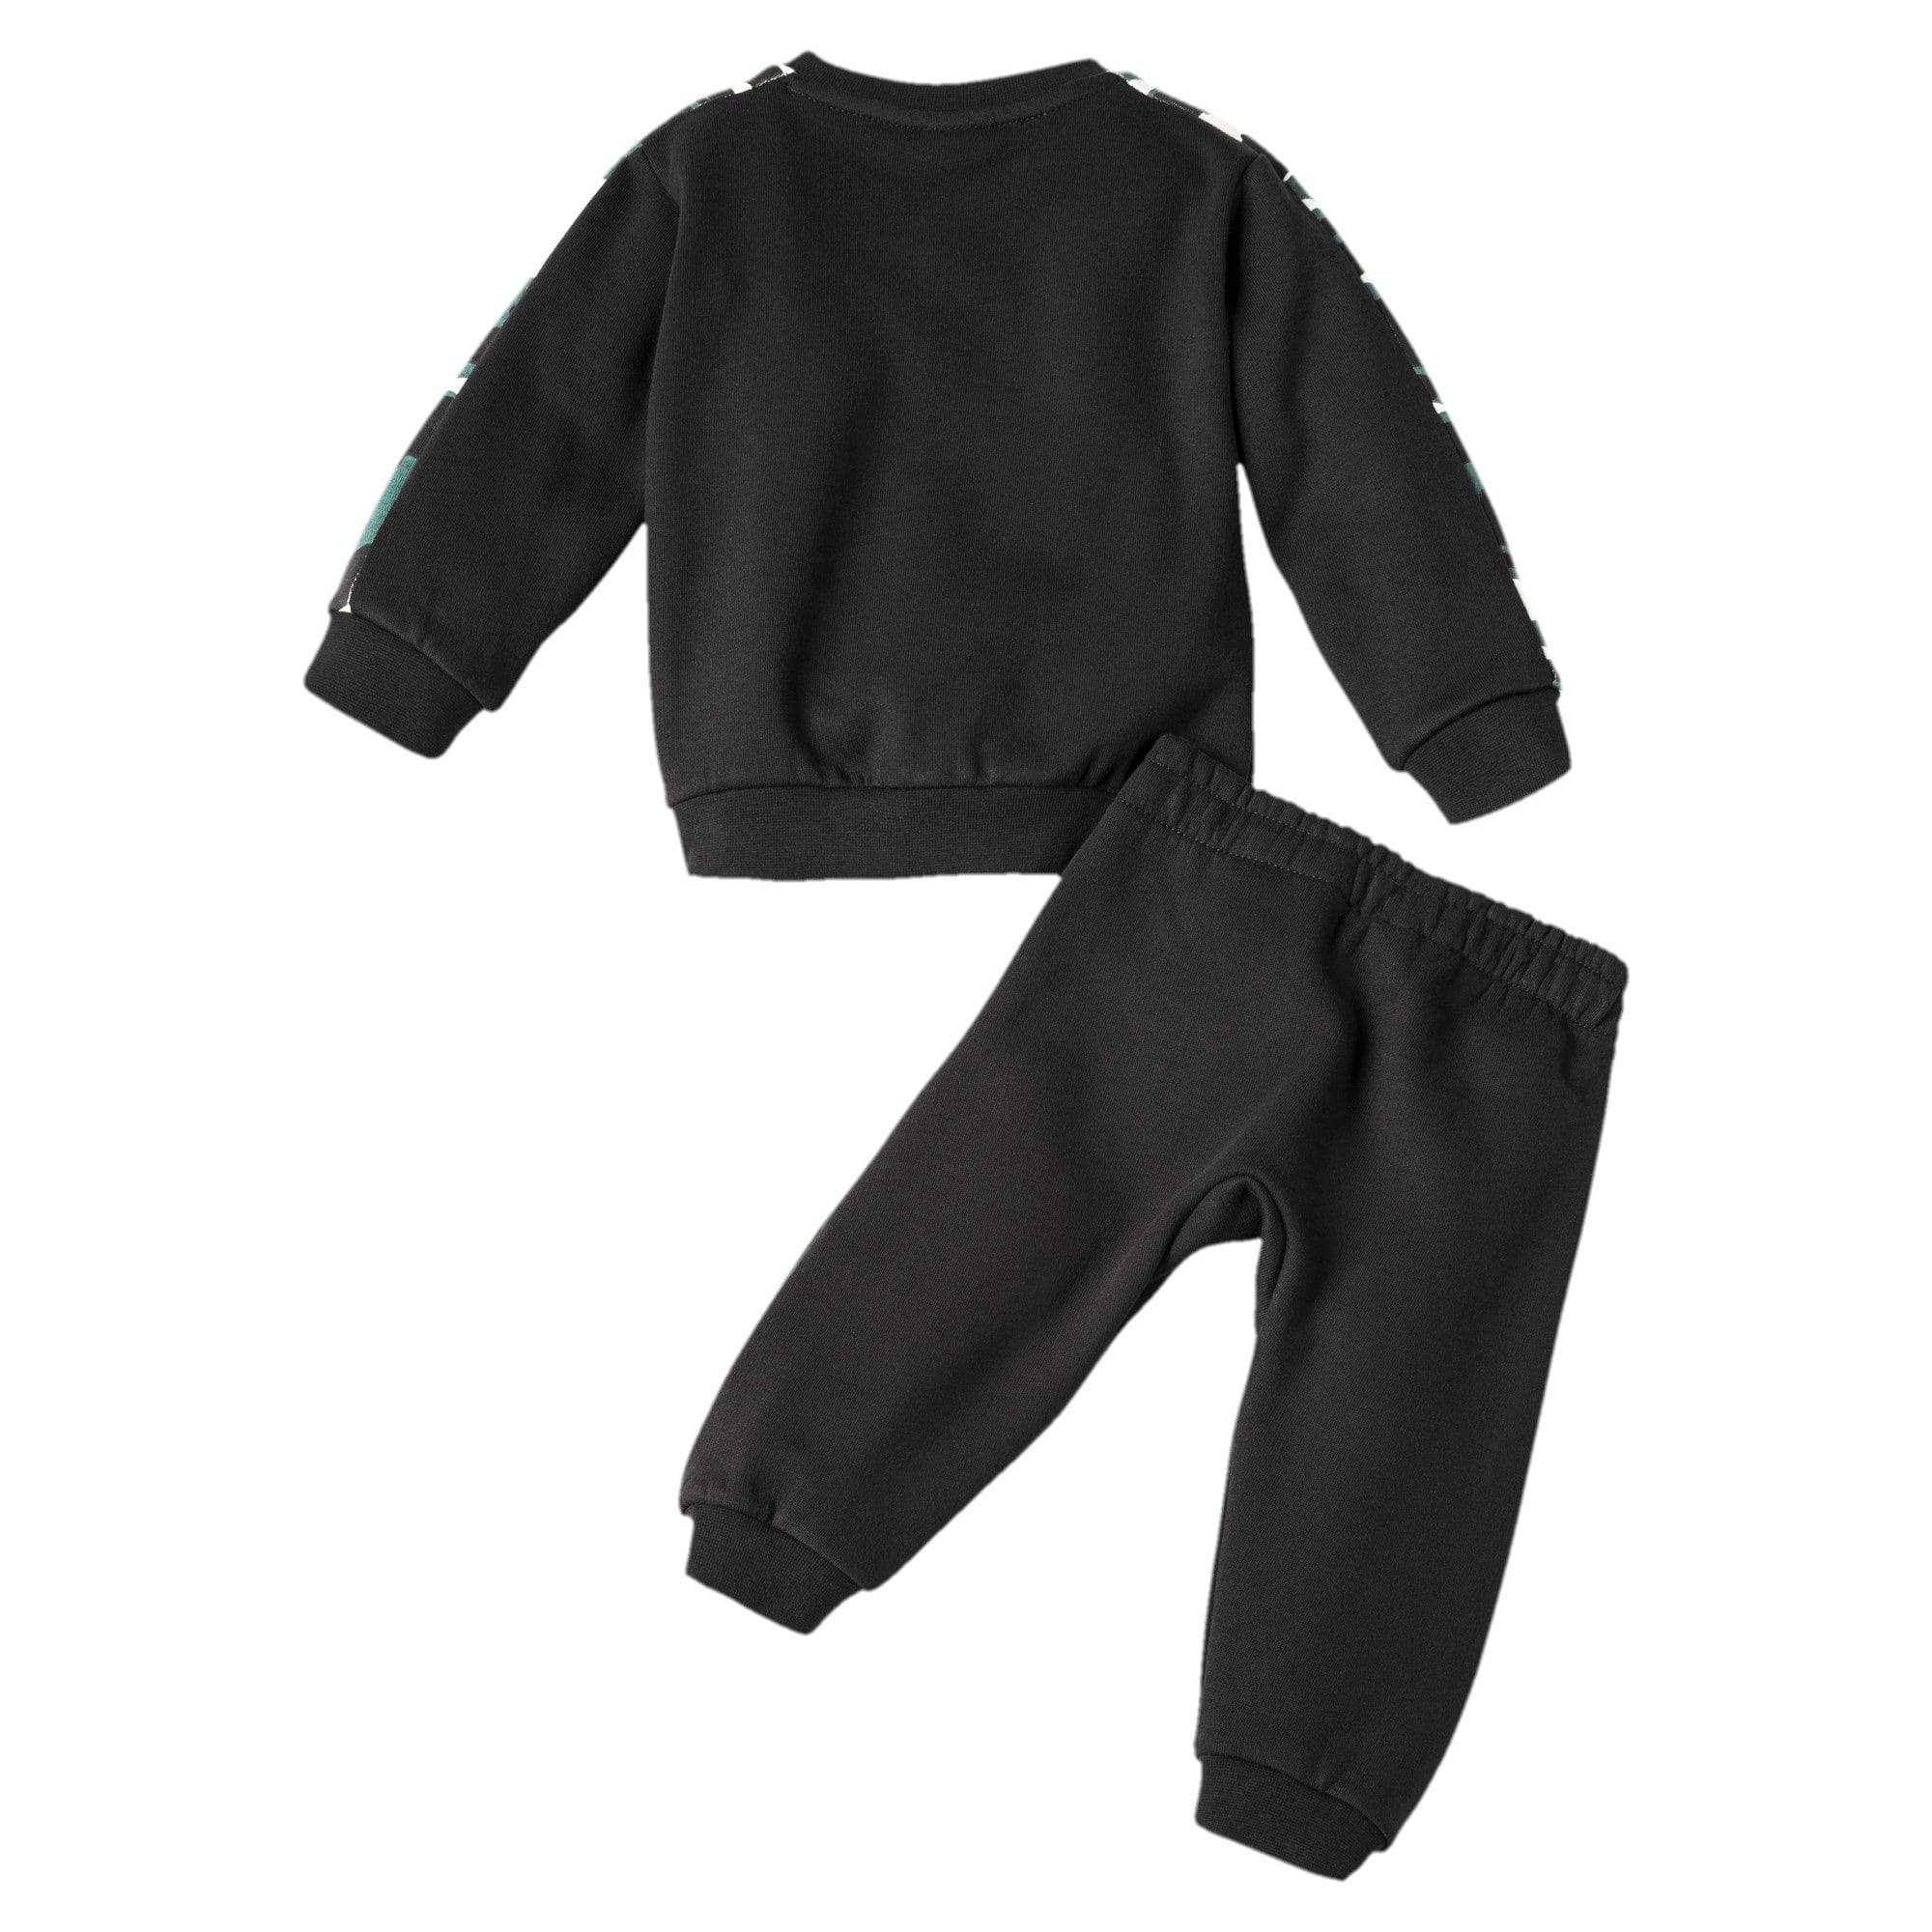 Thumbnail 2 of Street Wear T7 Babies' Jogger Set, Puma Black, medium